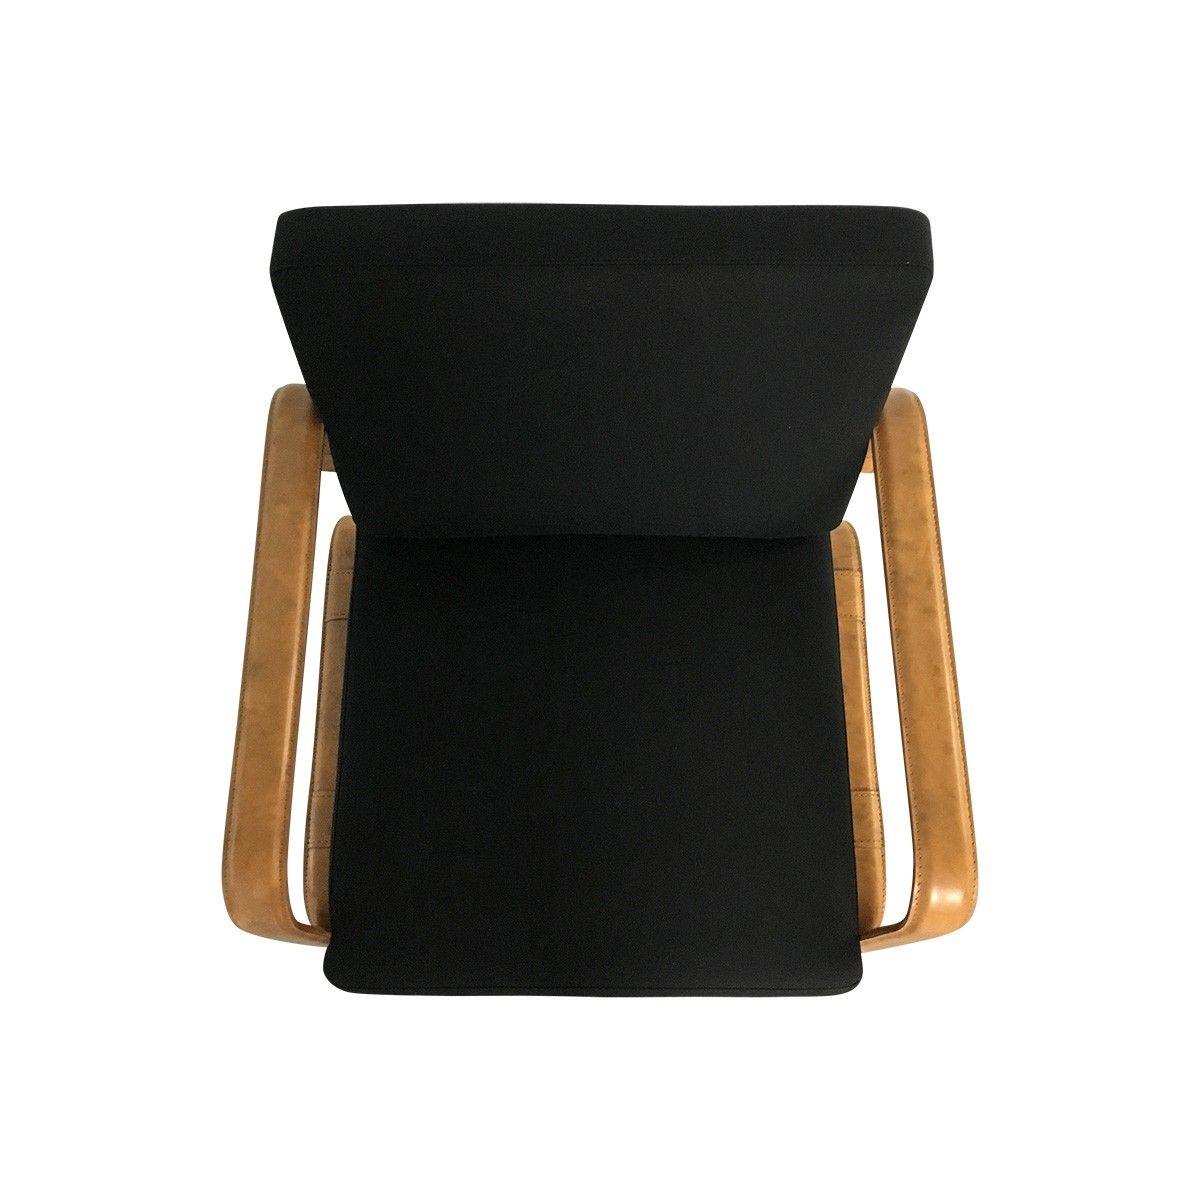 Desk Chair Plan View Nautical Outdoor Cushions Img 1572 1 Jpg 12001200 Top Pinterest Ps